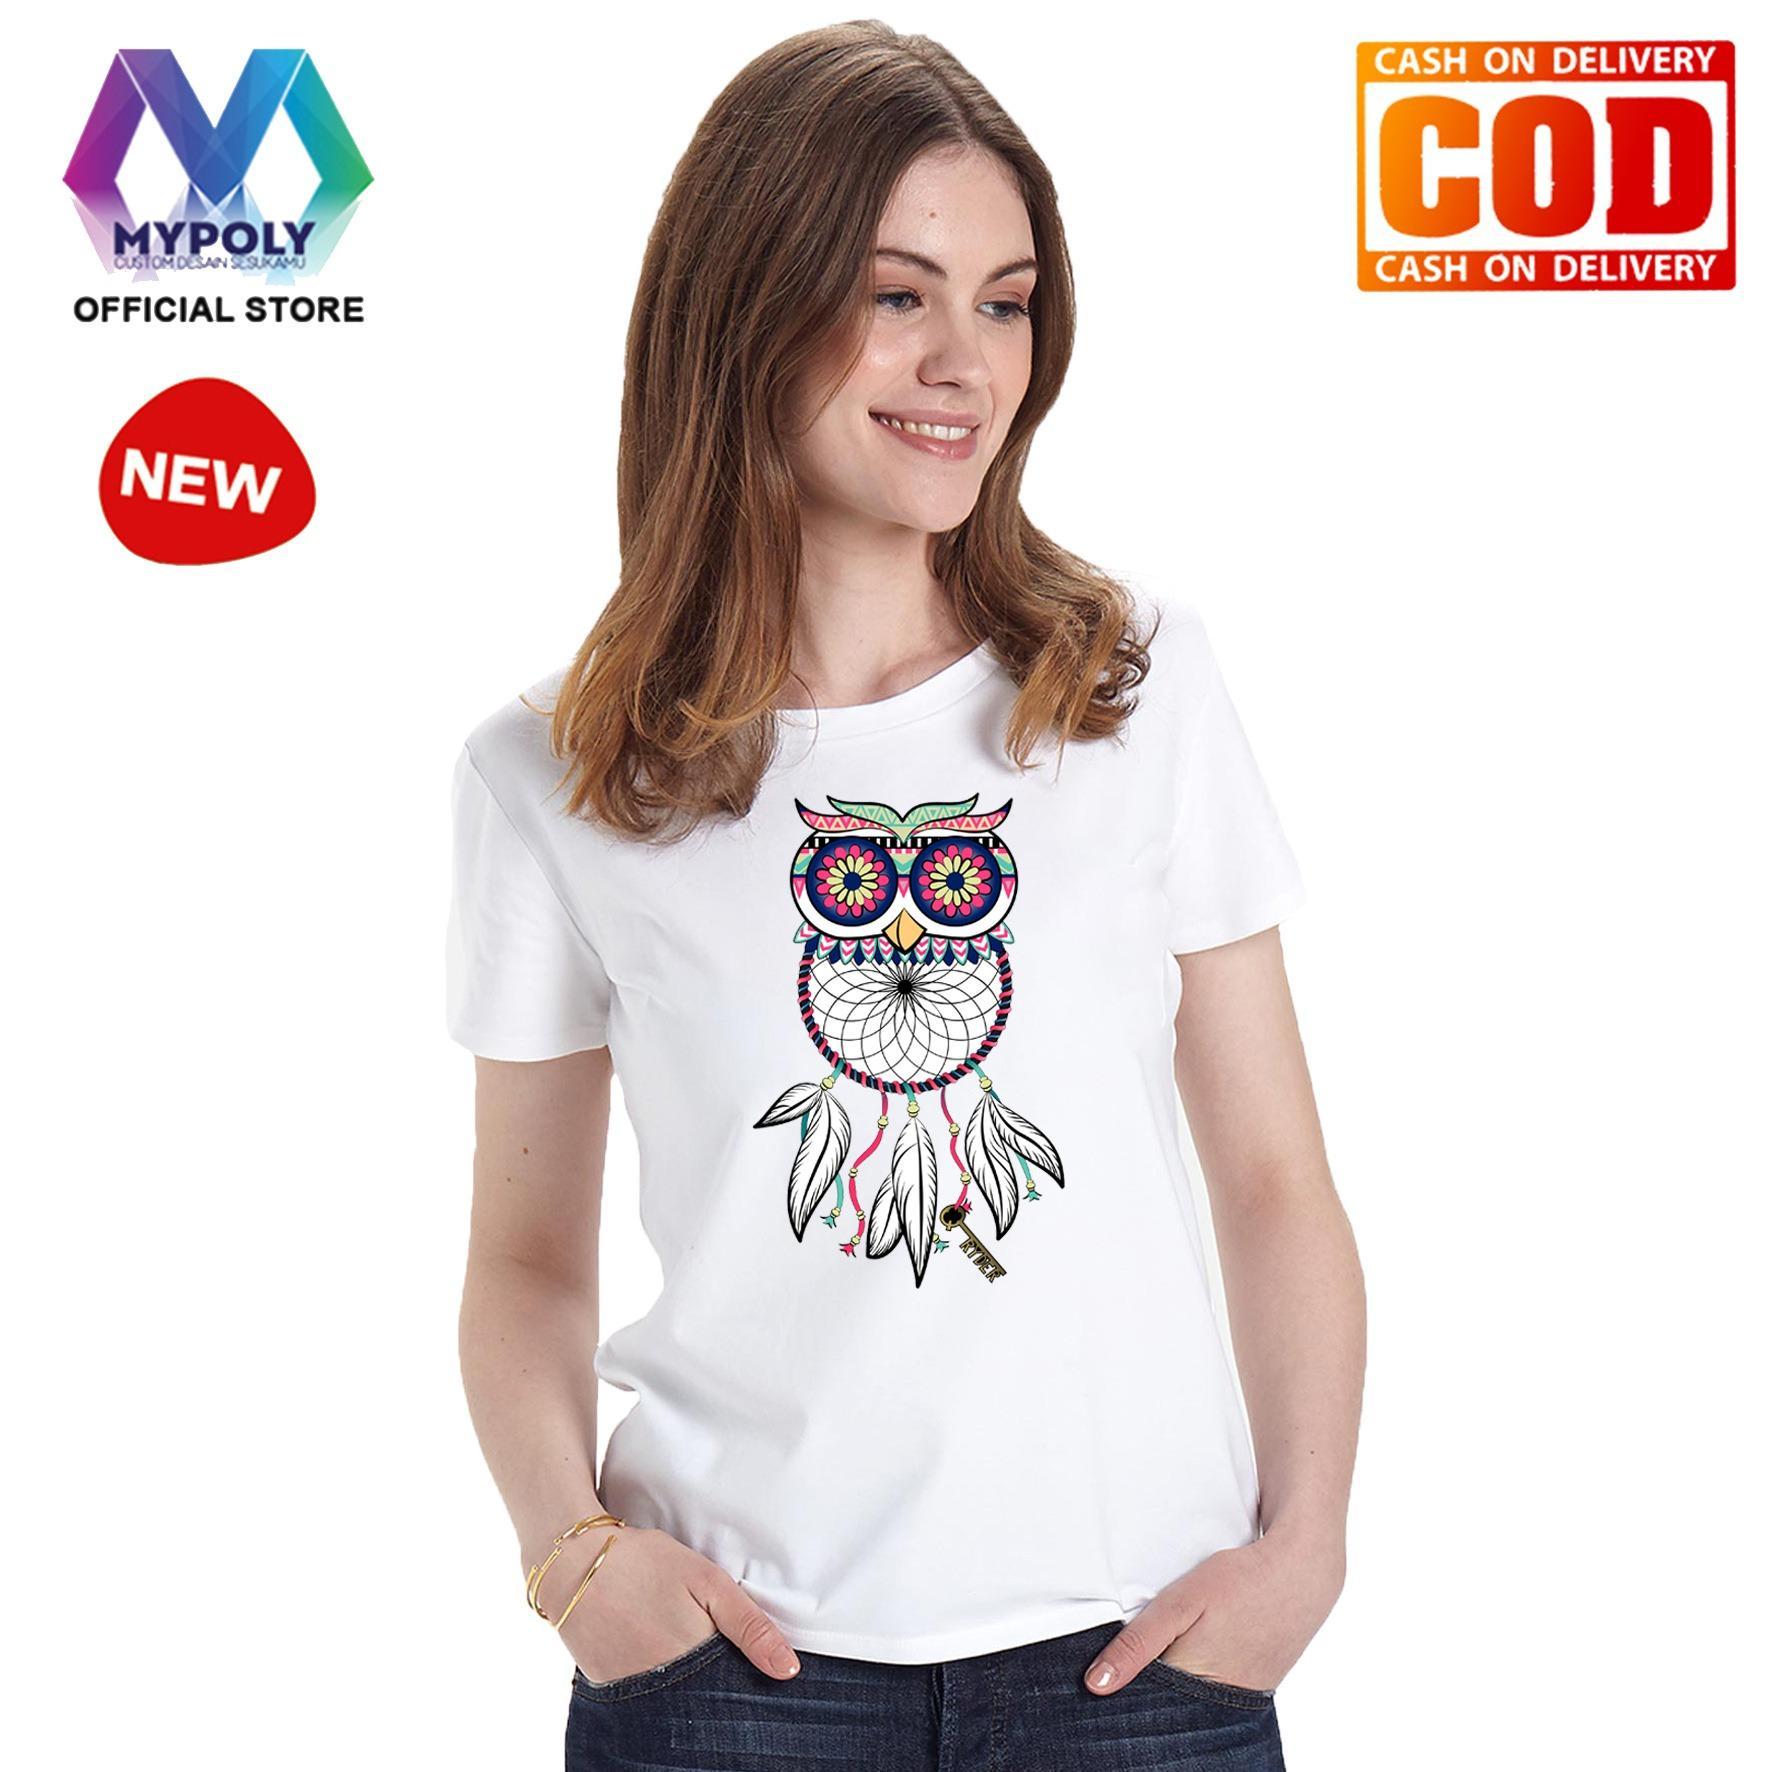 Kaos Premium Mypoly Wanita Perempuan WP / Baju Couple Family Keluarga / Tshirt distro Anak Wanita / Fashion atasan / Kaos Wanita Dewasa Owl Catcher